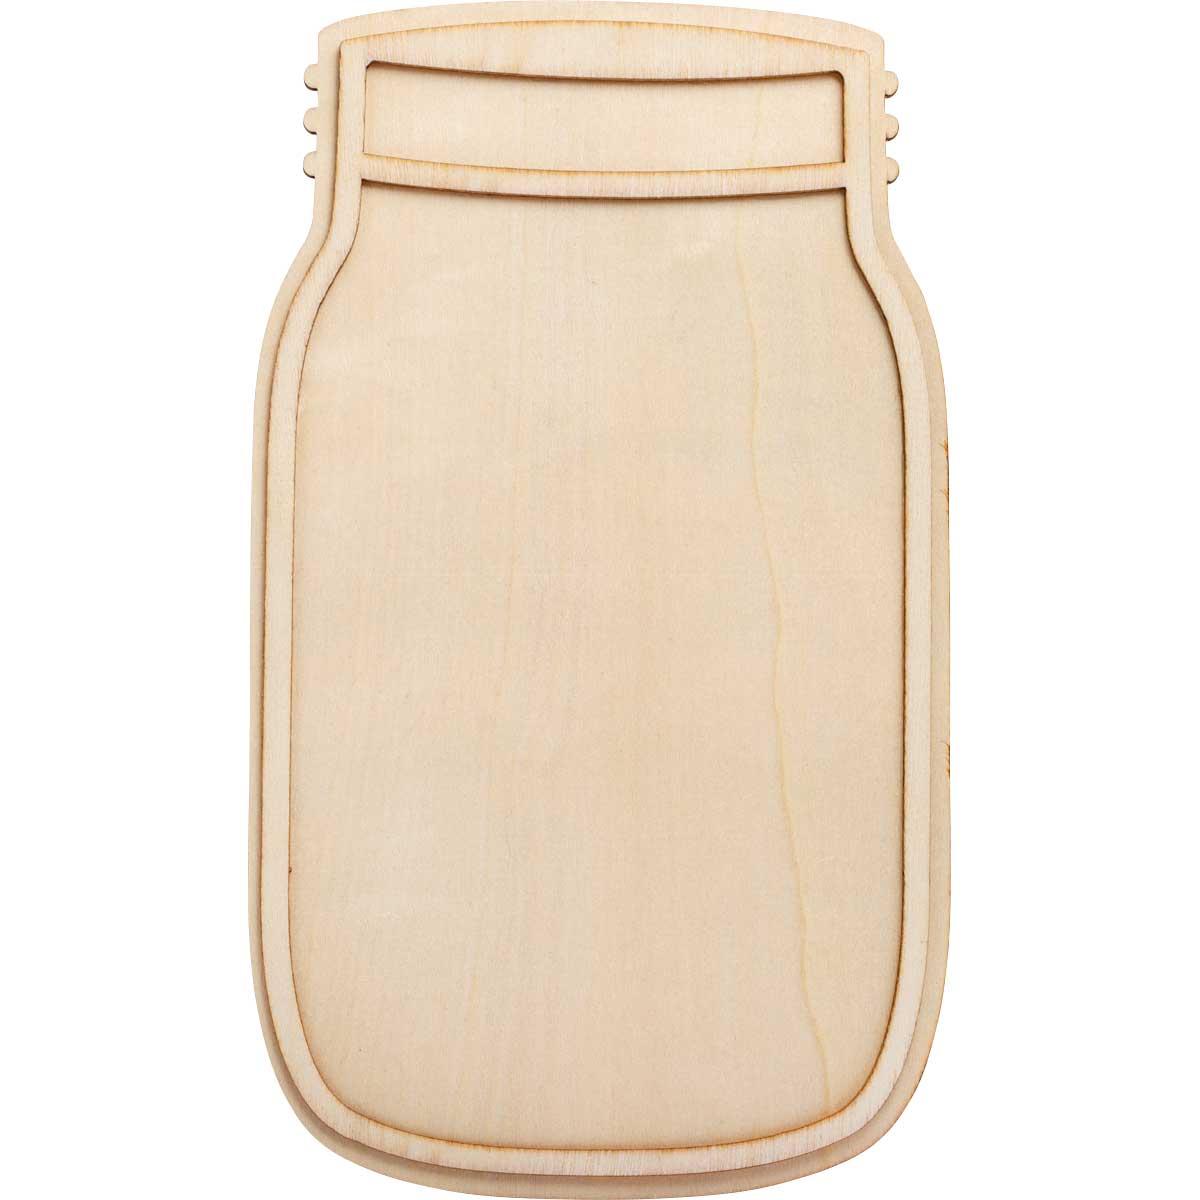 Plaid ® Wood Surfaces - Unpainted Layered Shapes - Mason Jar 10